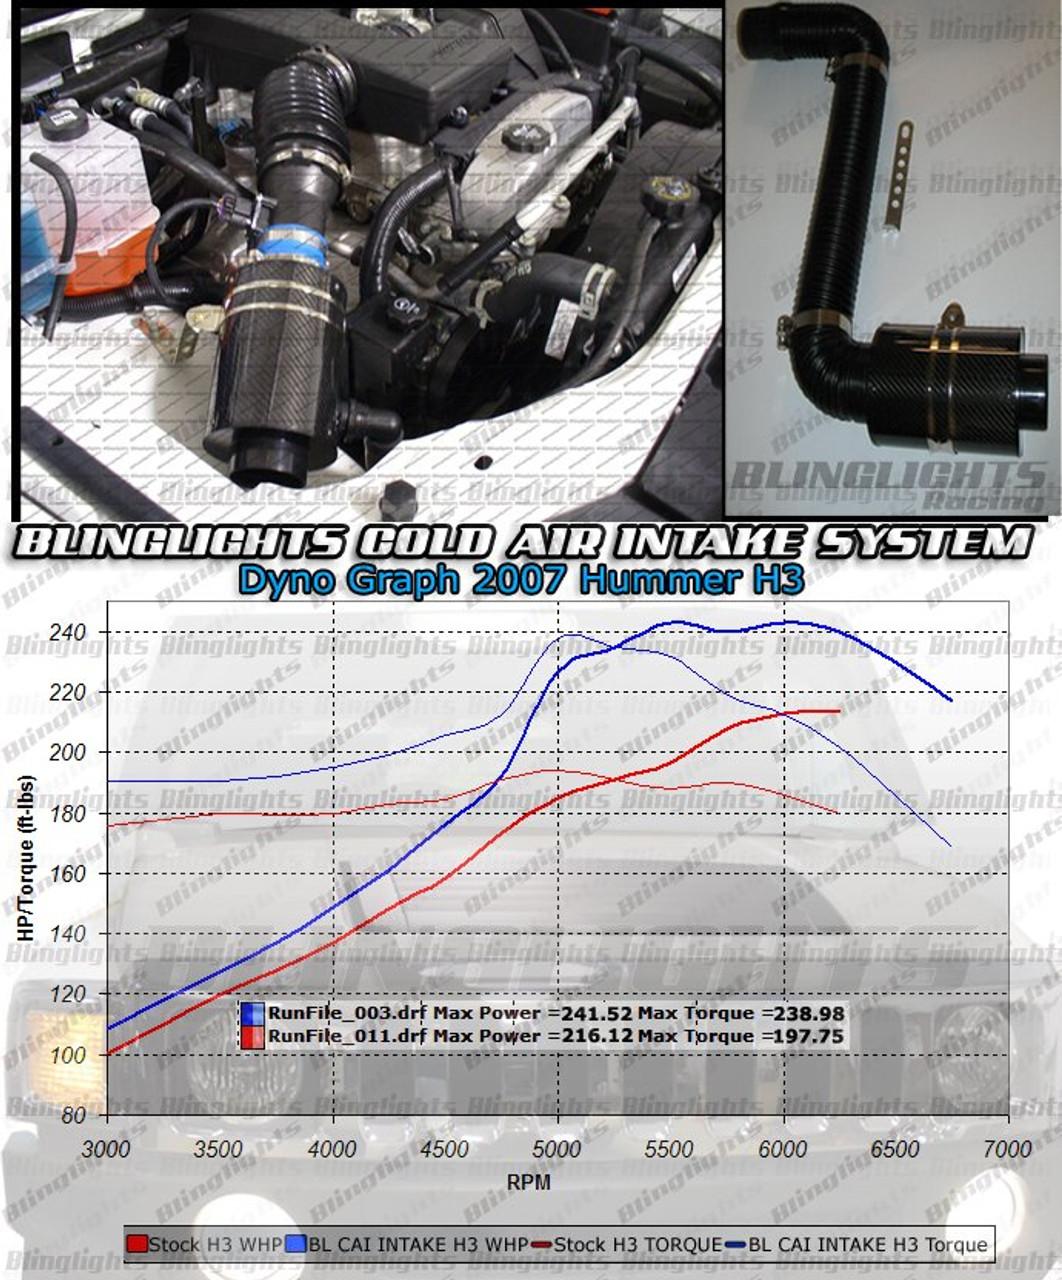 bmw e30 e32 e34 e36 e46 318i 325i m3 cold air intake motor engine performance cai [ 1062 x 1280 Pixel ]